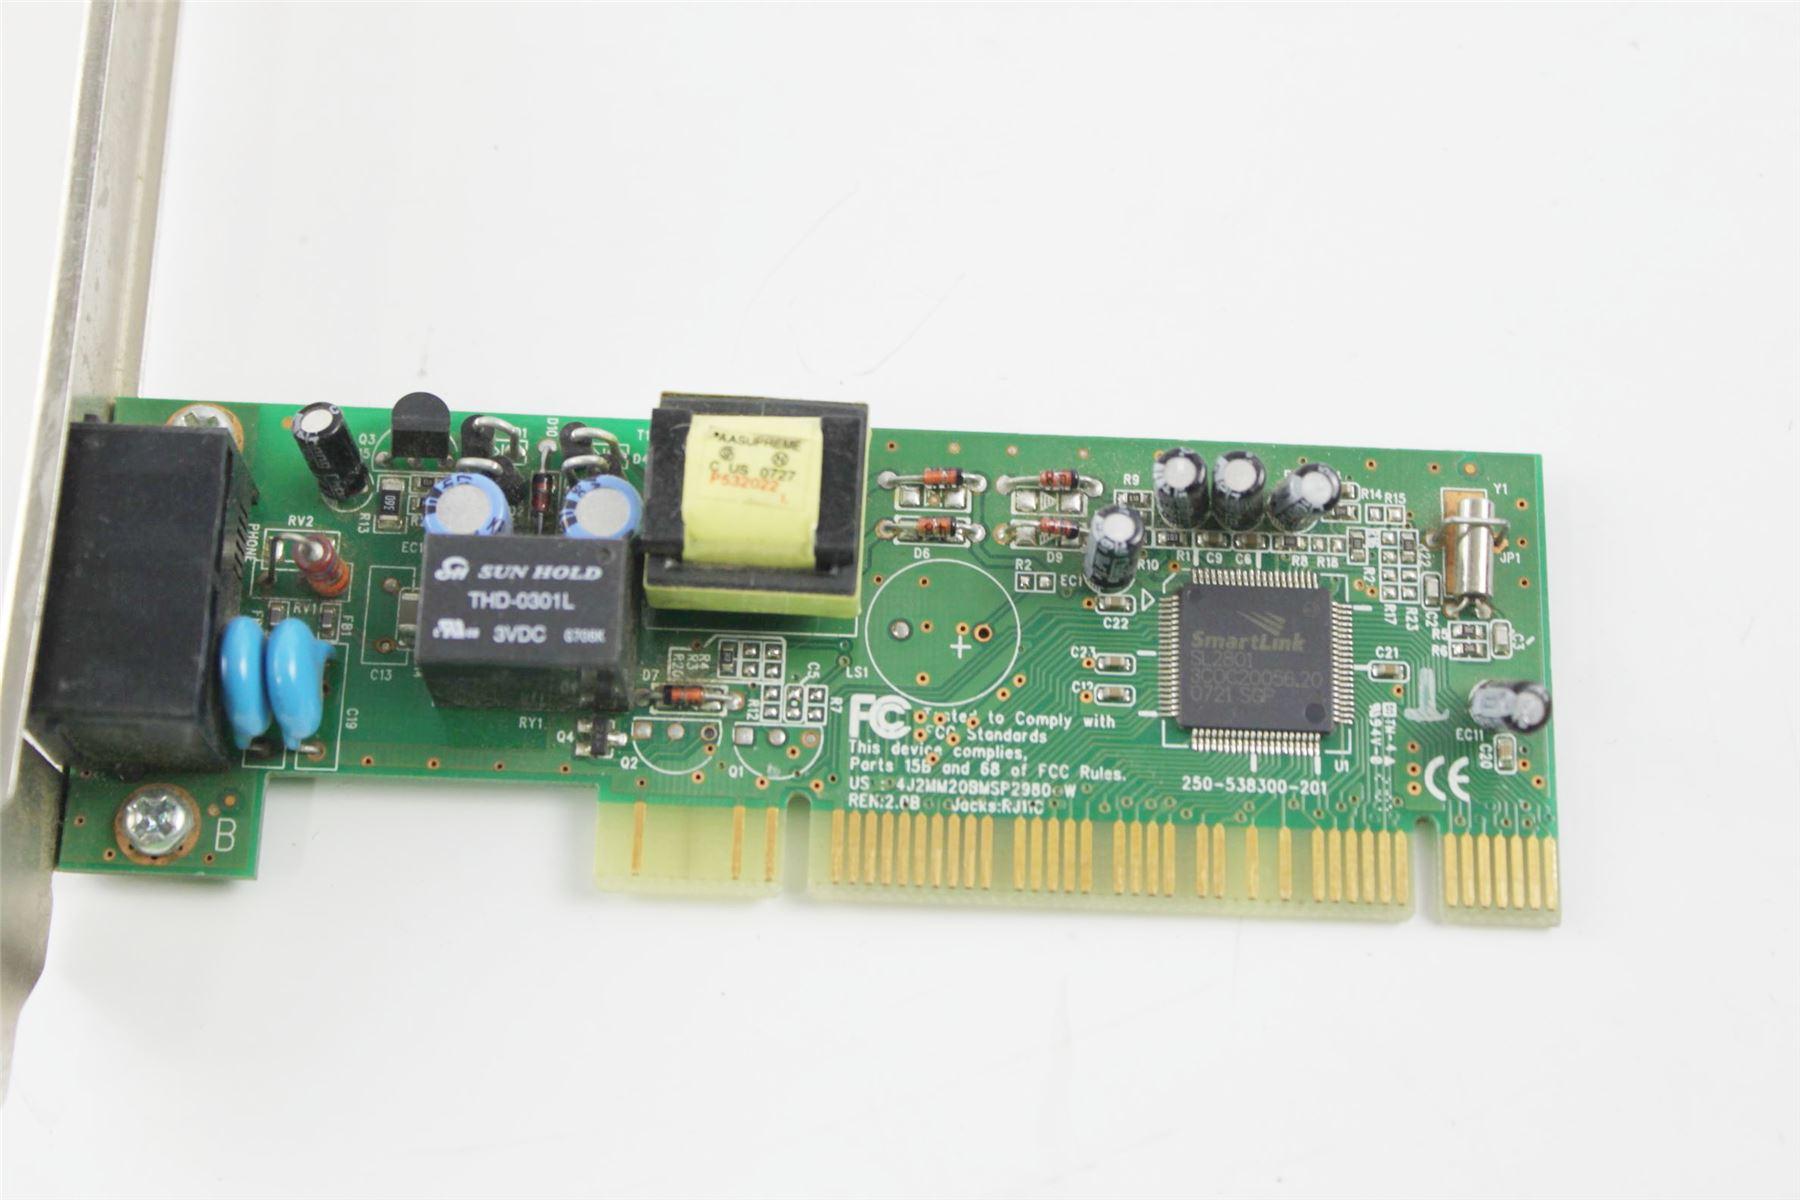 10-100 LAN High Profile Dual Port PCI Network 56K Modem Card 250-538300-201